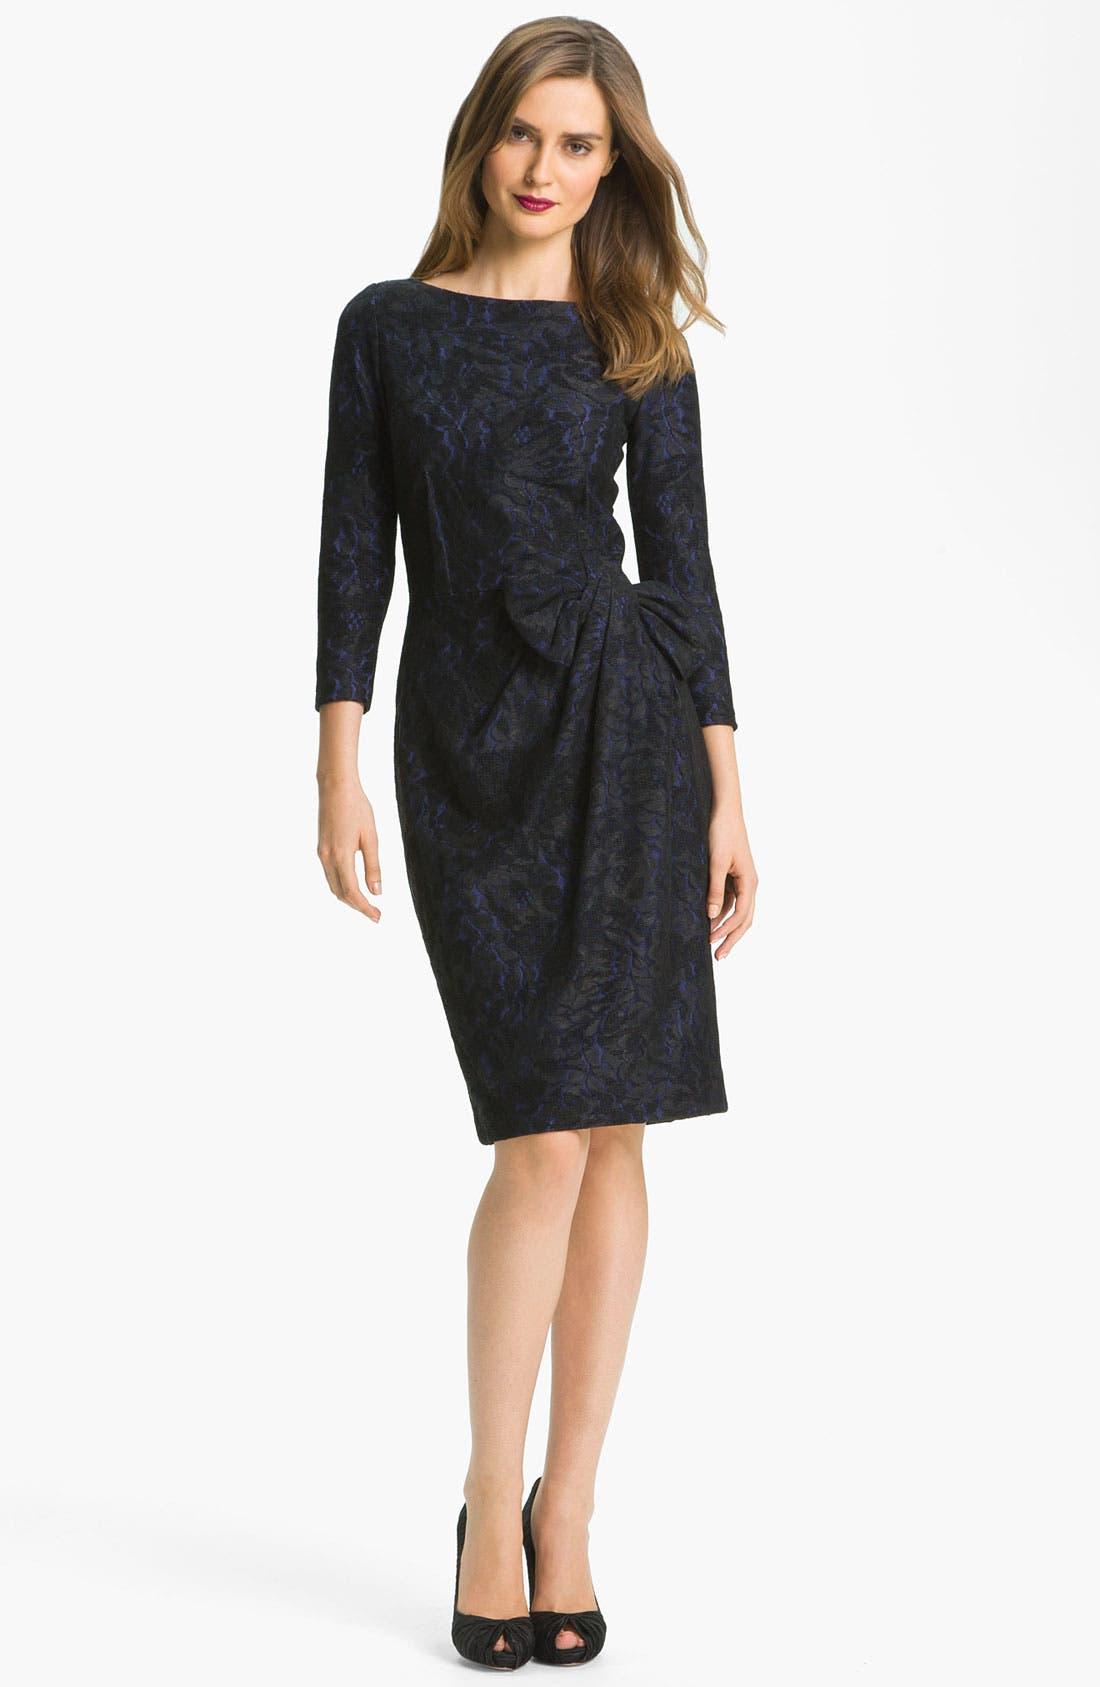 Main Image - David Meister Textured Bow Detail Sheath Dress